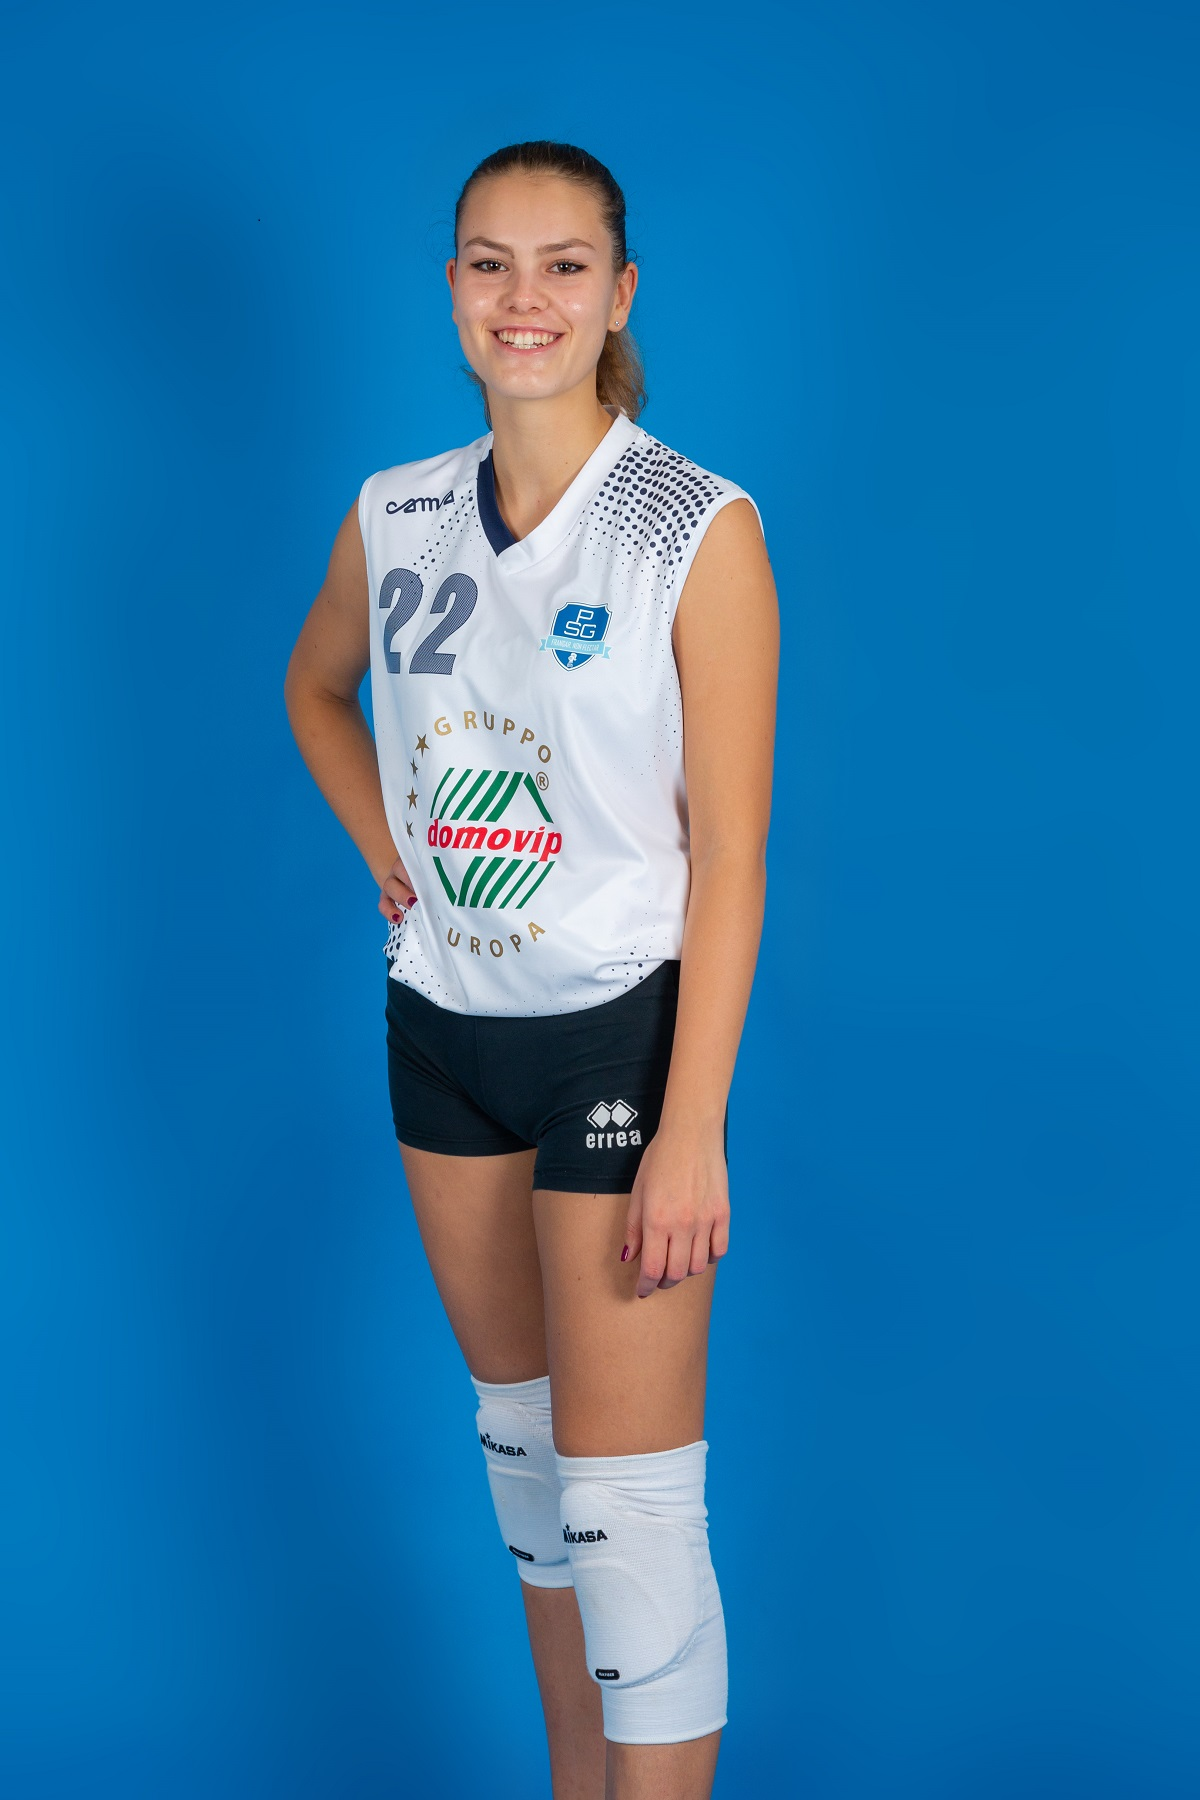 Giorgia Camol